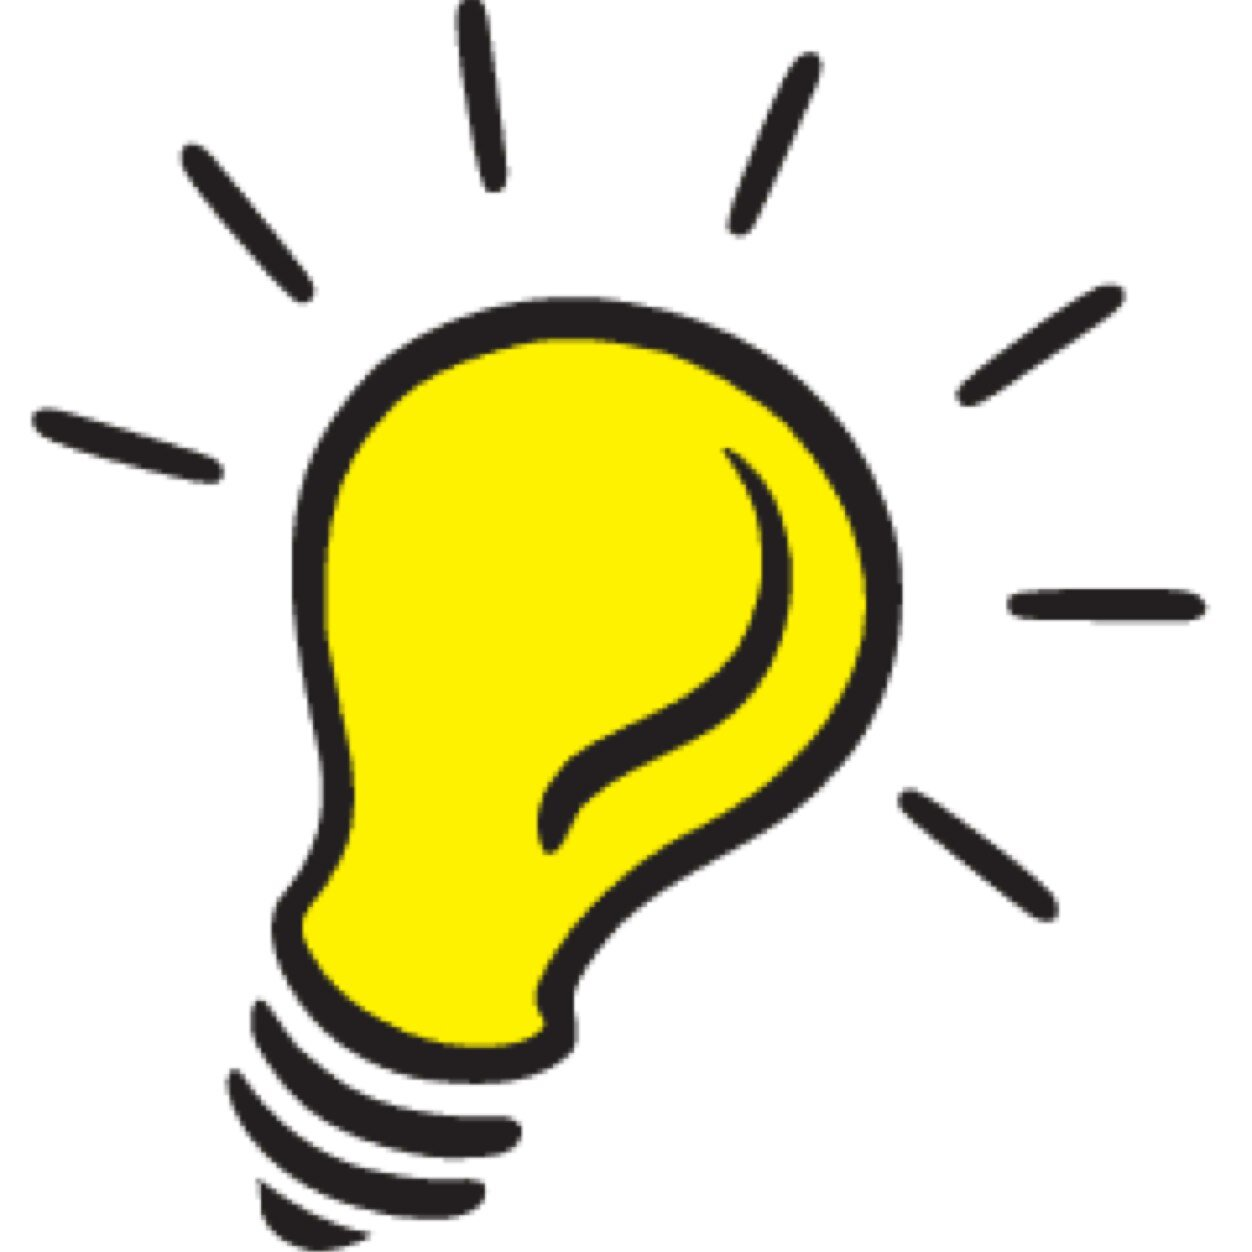 Light Bulb clipart transparent background Bulb Free Bulb Image Light